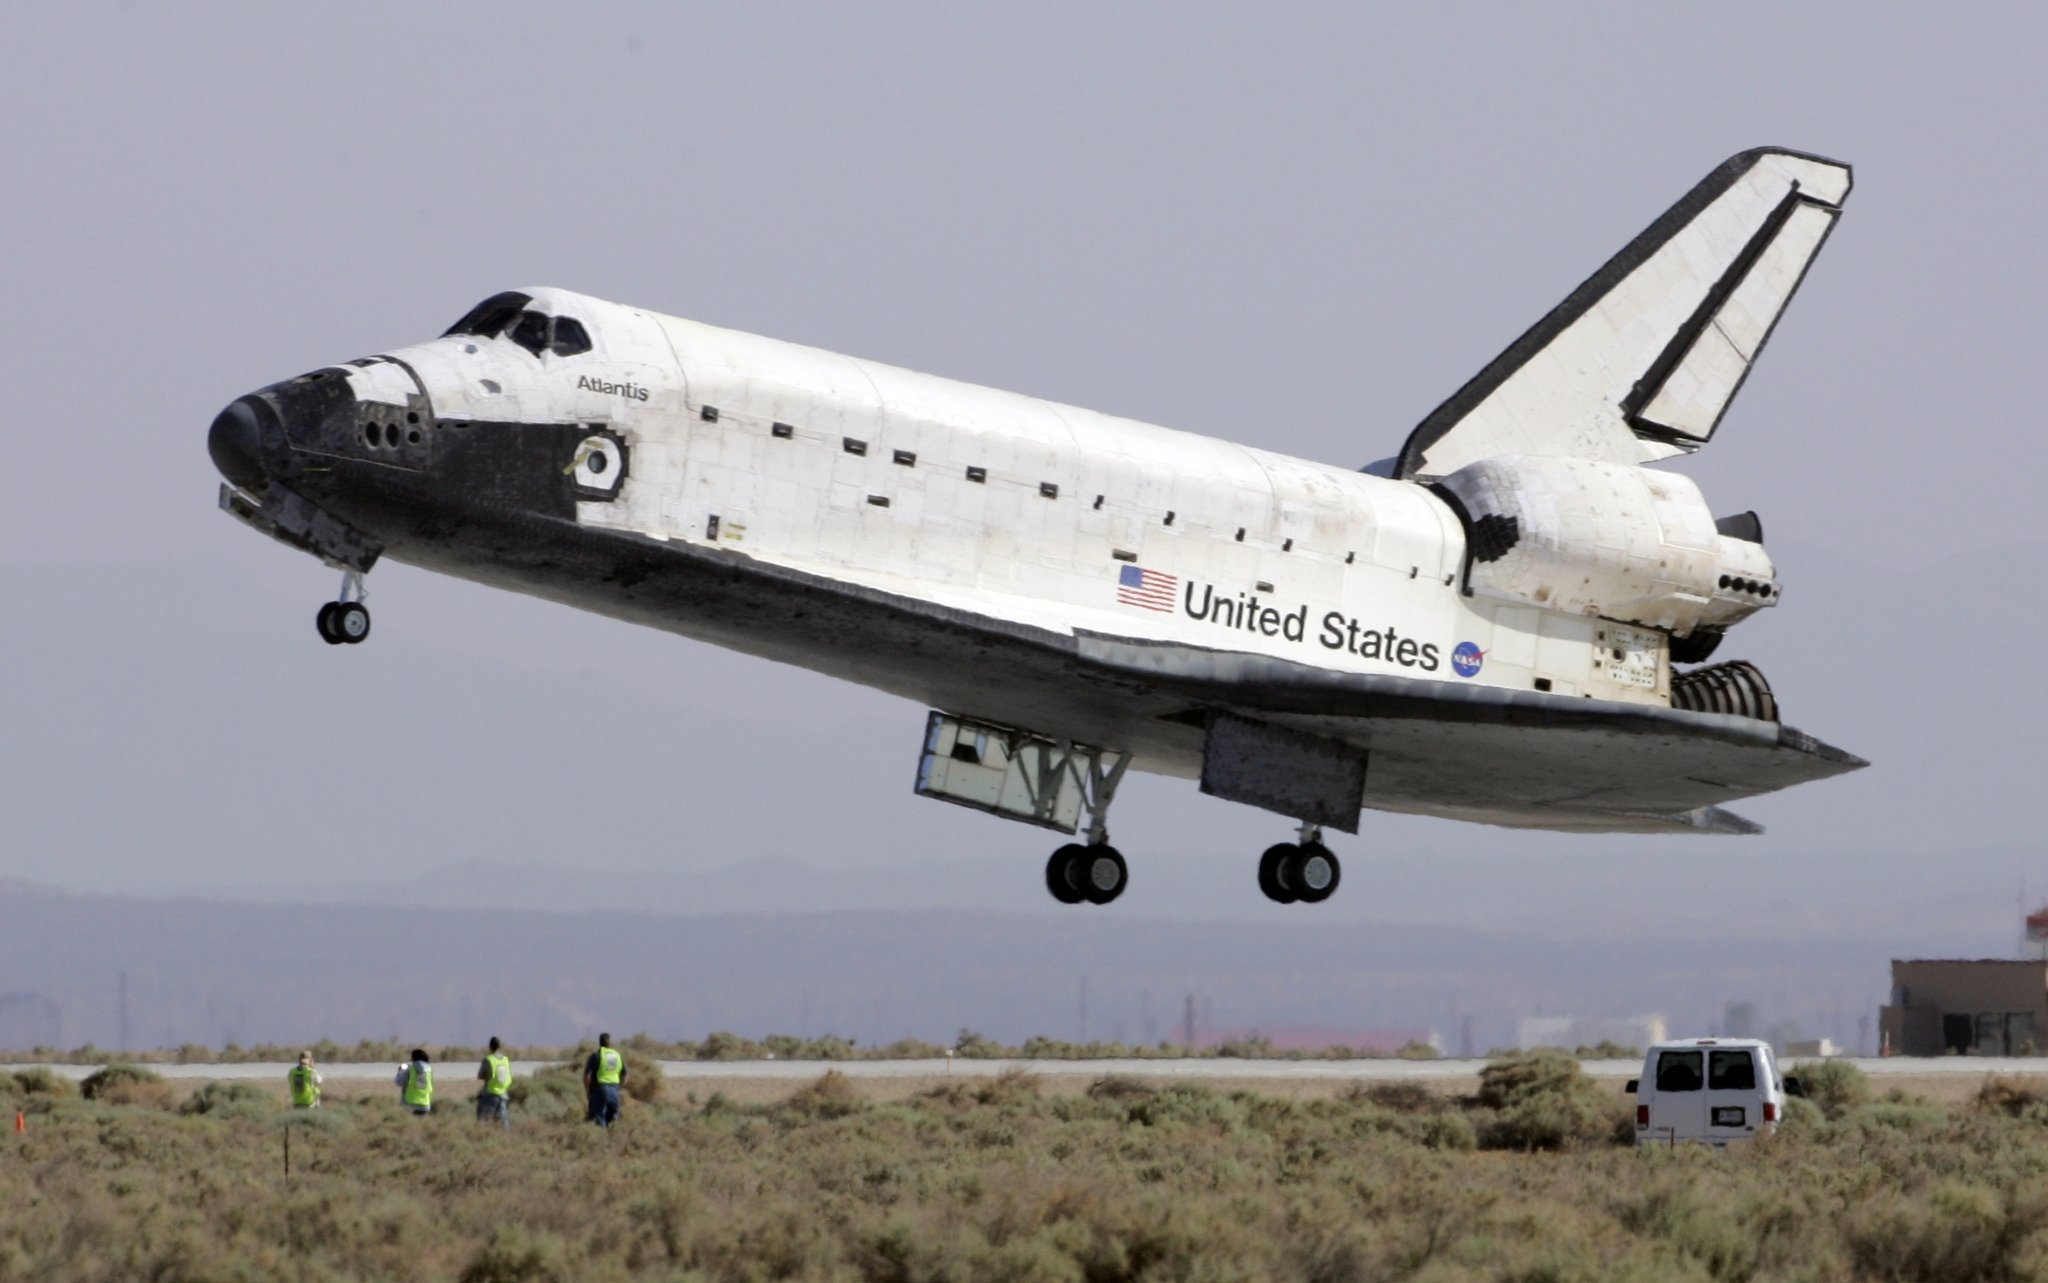 shuttle-landingjpg-a79ae9547090adca